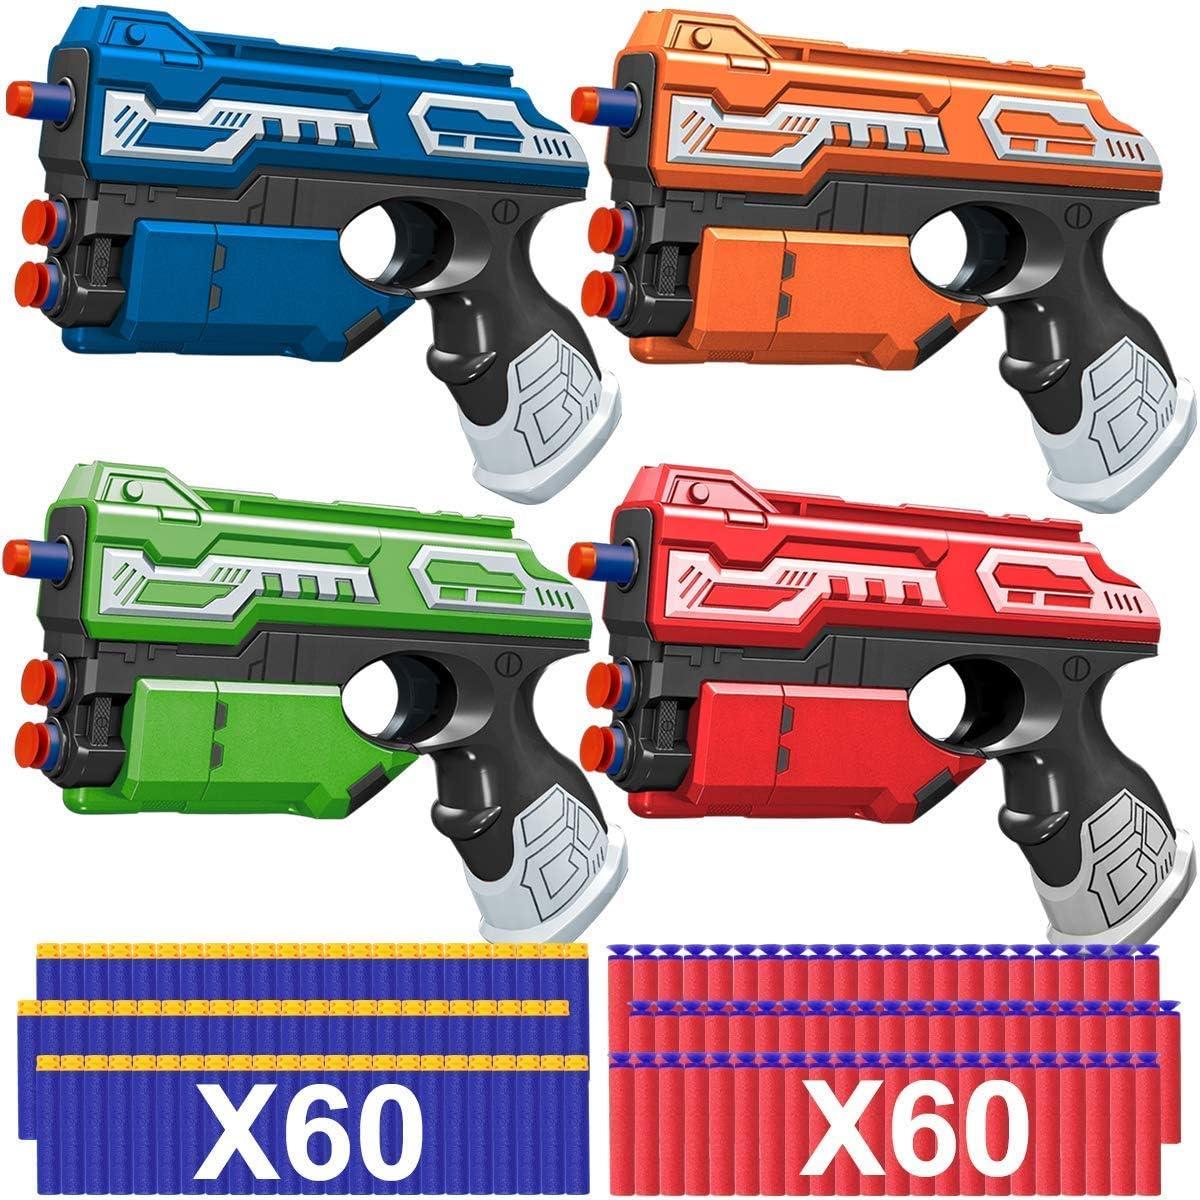 POKONBOY 4 Pack Blaster Guns Toy Guns for Boys Girls, Foam Dart Guns with 120 PCS Refill Bullets Hand Gun Toys for Kids 6 7 8 9 Birthday